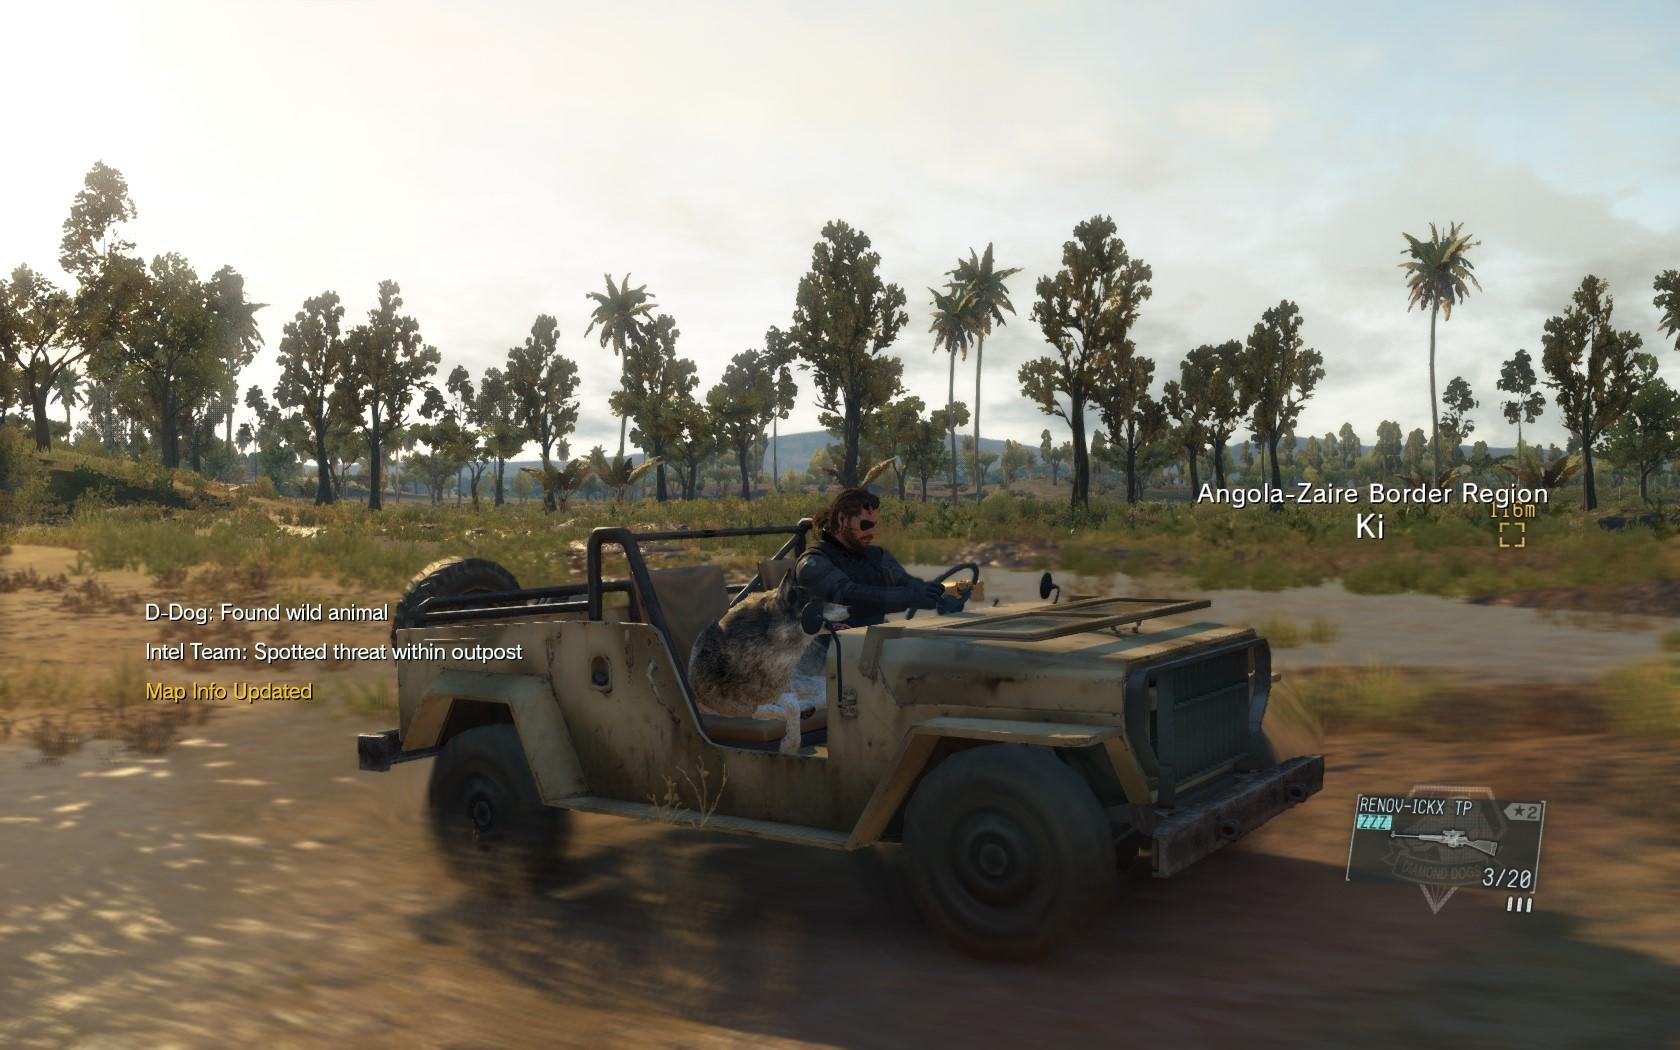 Metal_Gear_Solid_5_screenshot_00